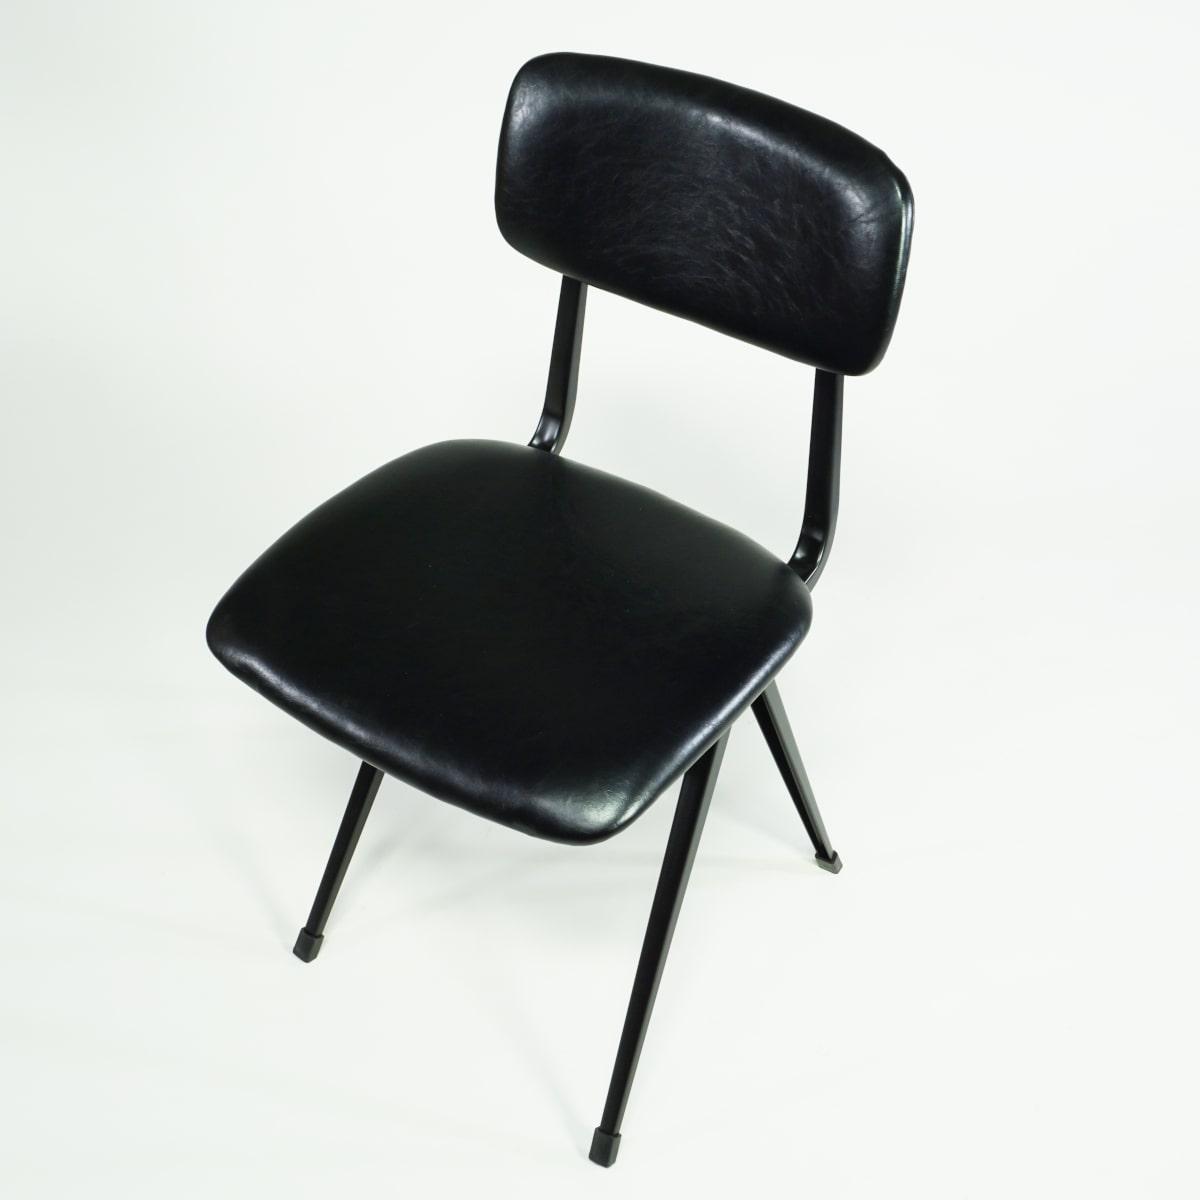 Stuhl Industrial Vintage Design schwarz